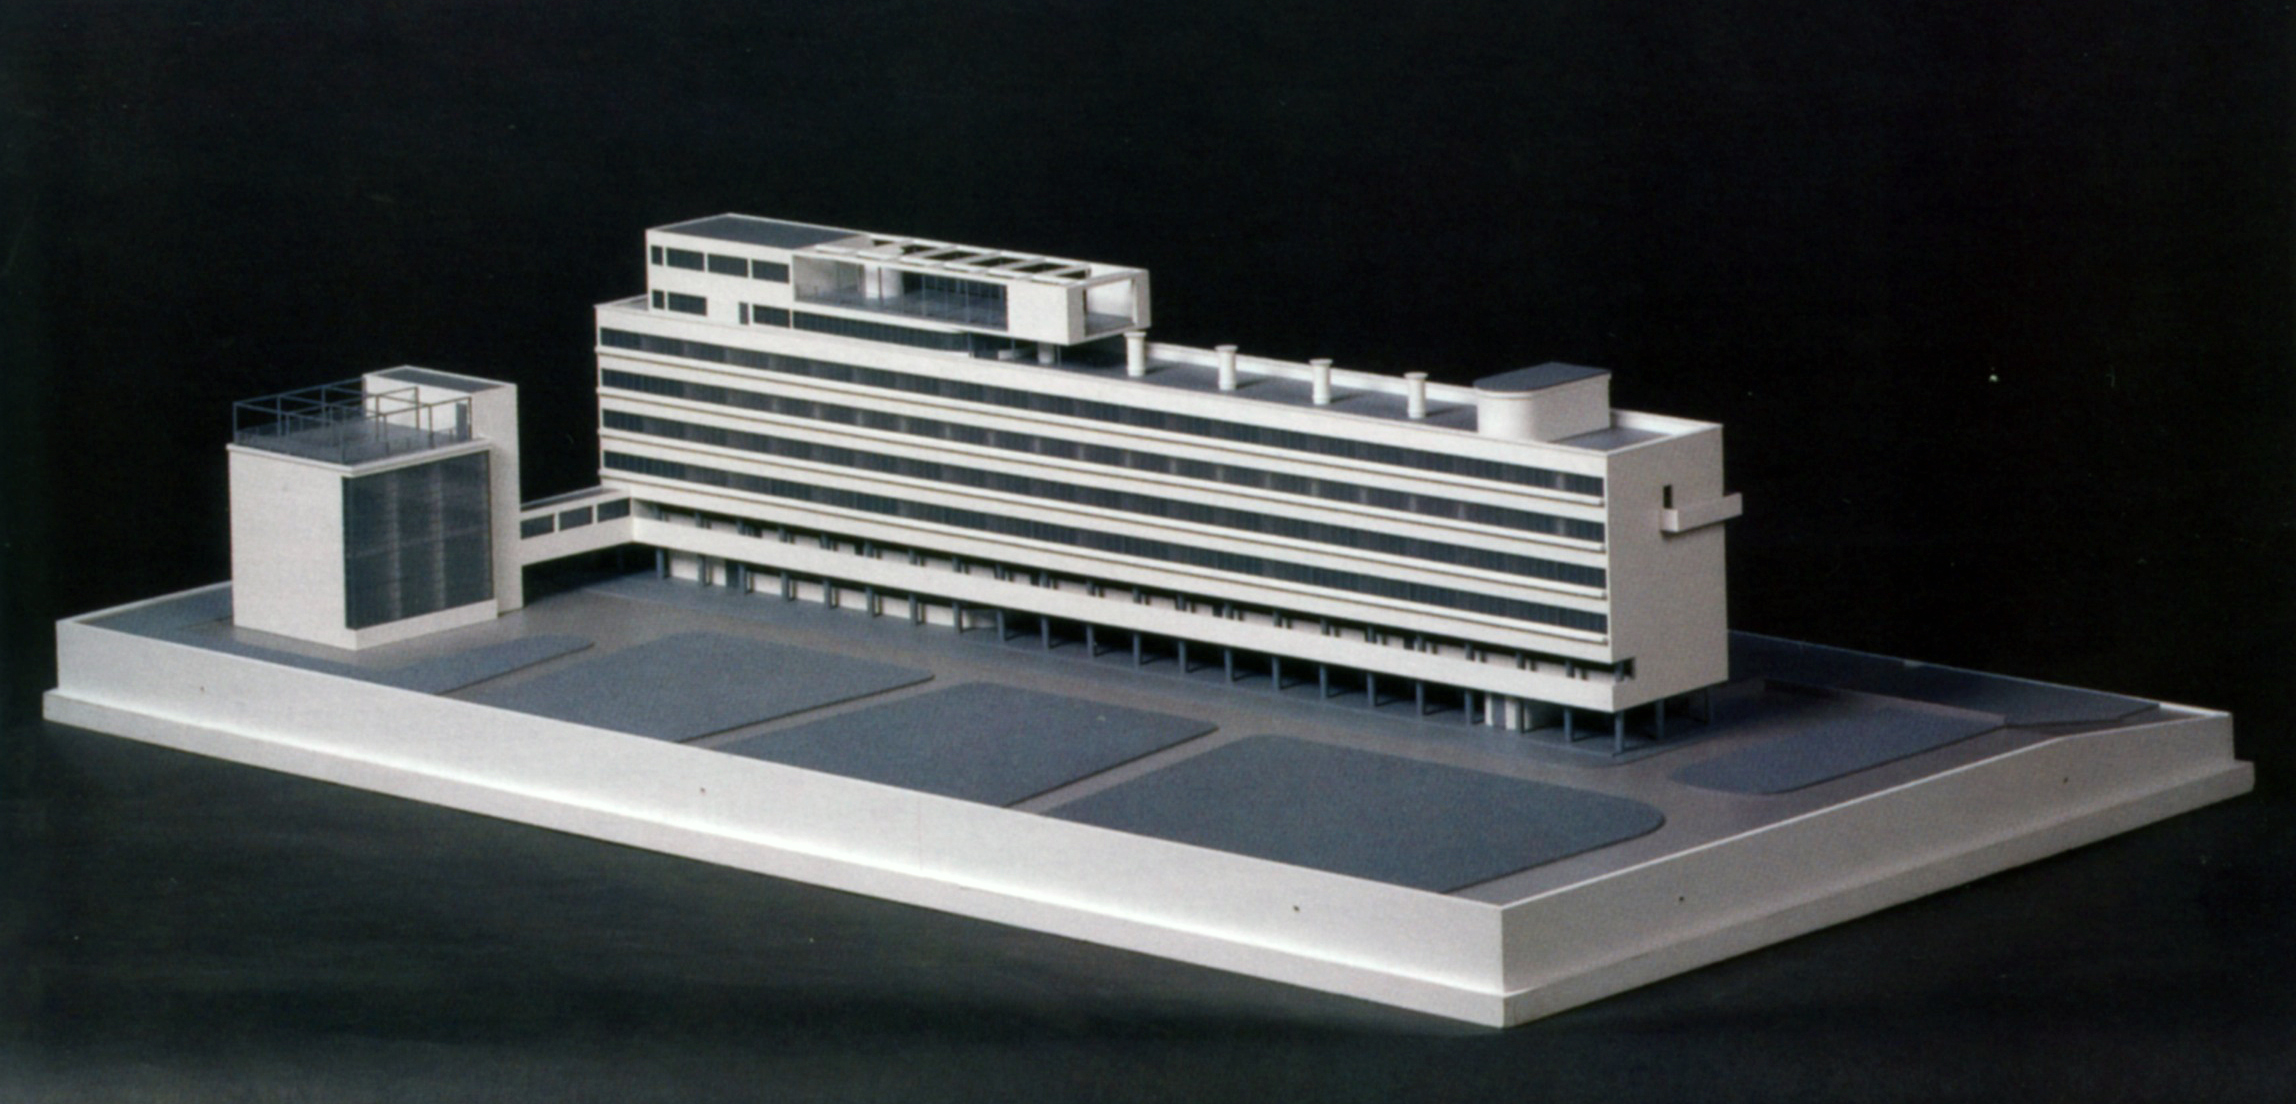 Alexei Ginzburg's model for the restoration of the Narkomfin